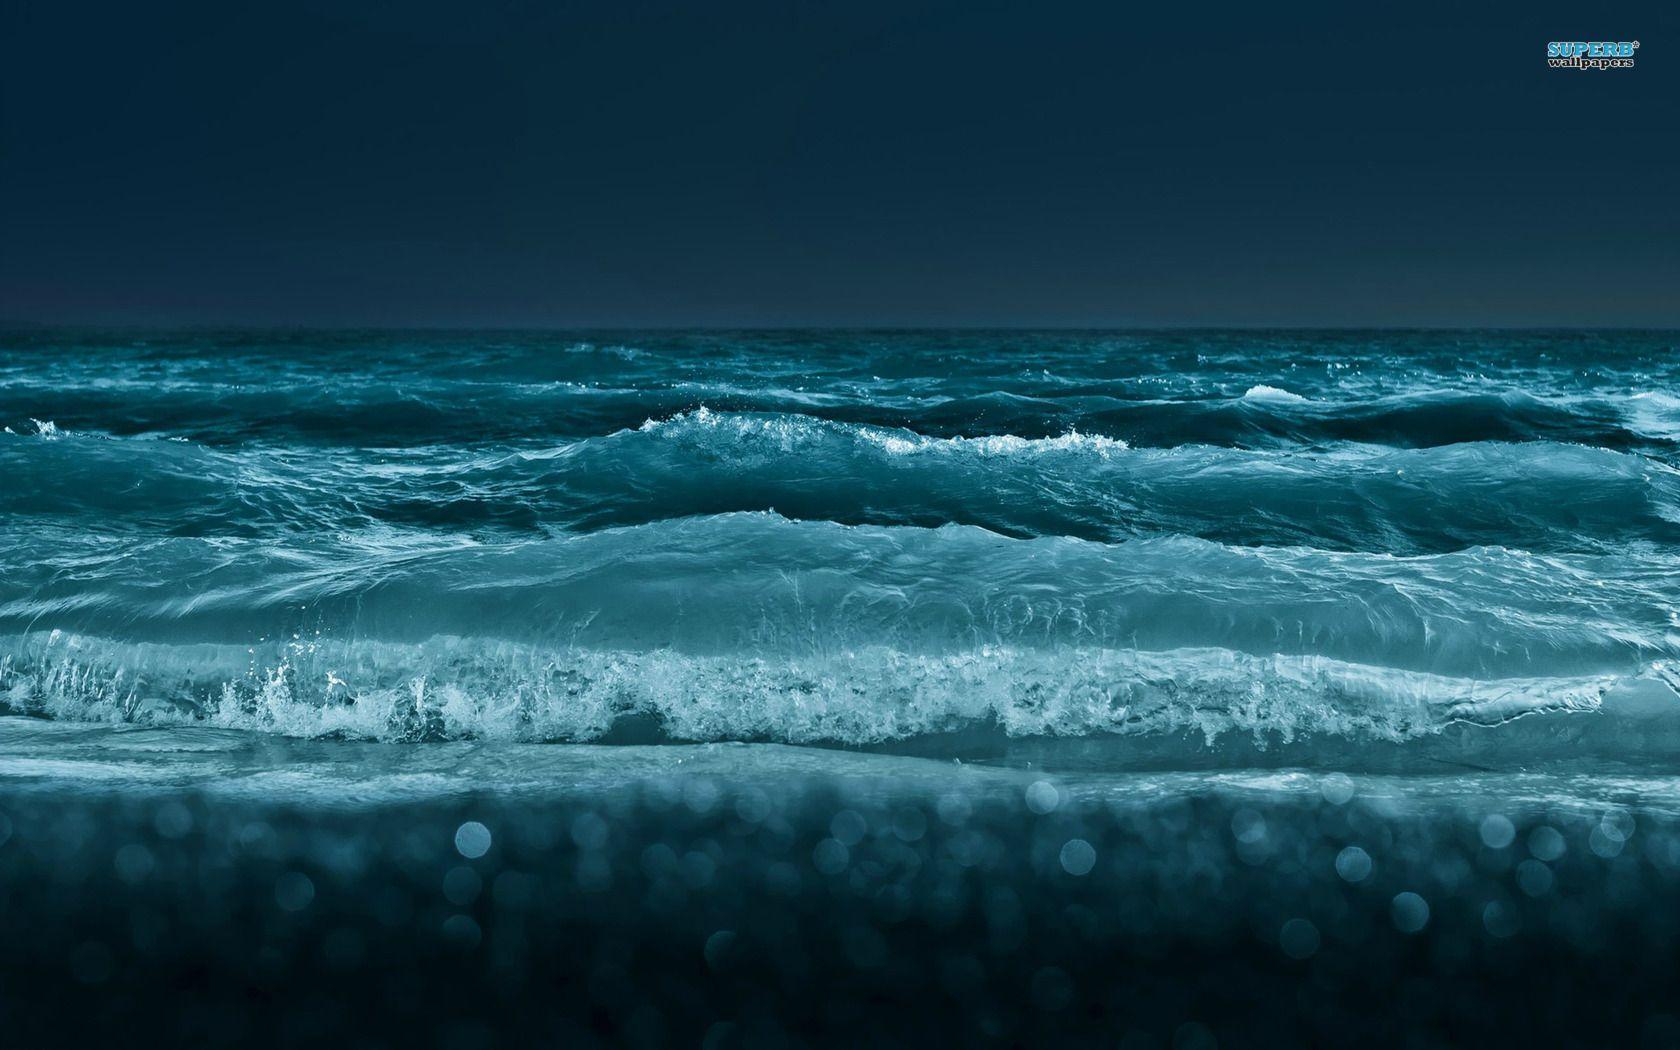 Wallpapers For Ocean Waves